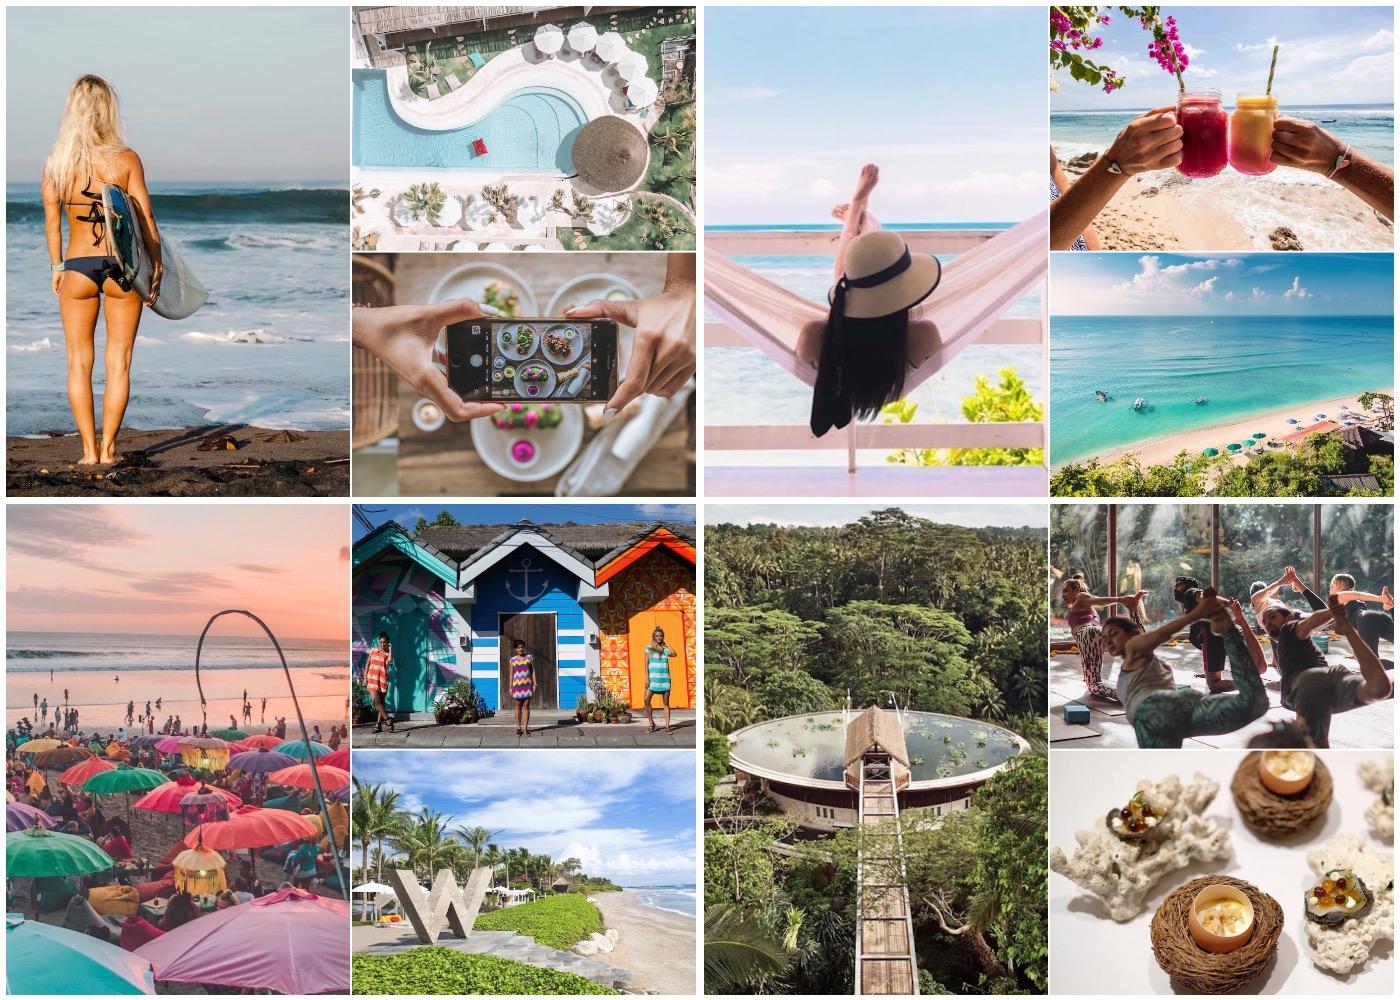 Where to stay in Bali: From Seminyak & Canggu, to Uluwatu, Ubud & beyond, here's your guide to Bali's neighbourhoods